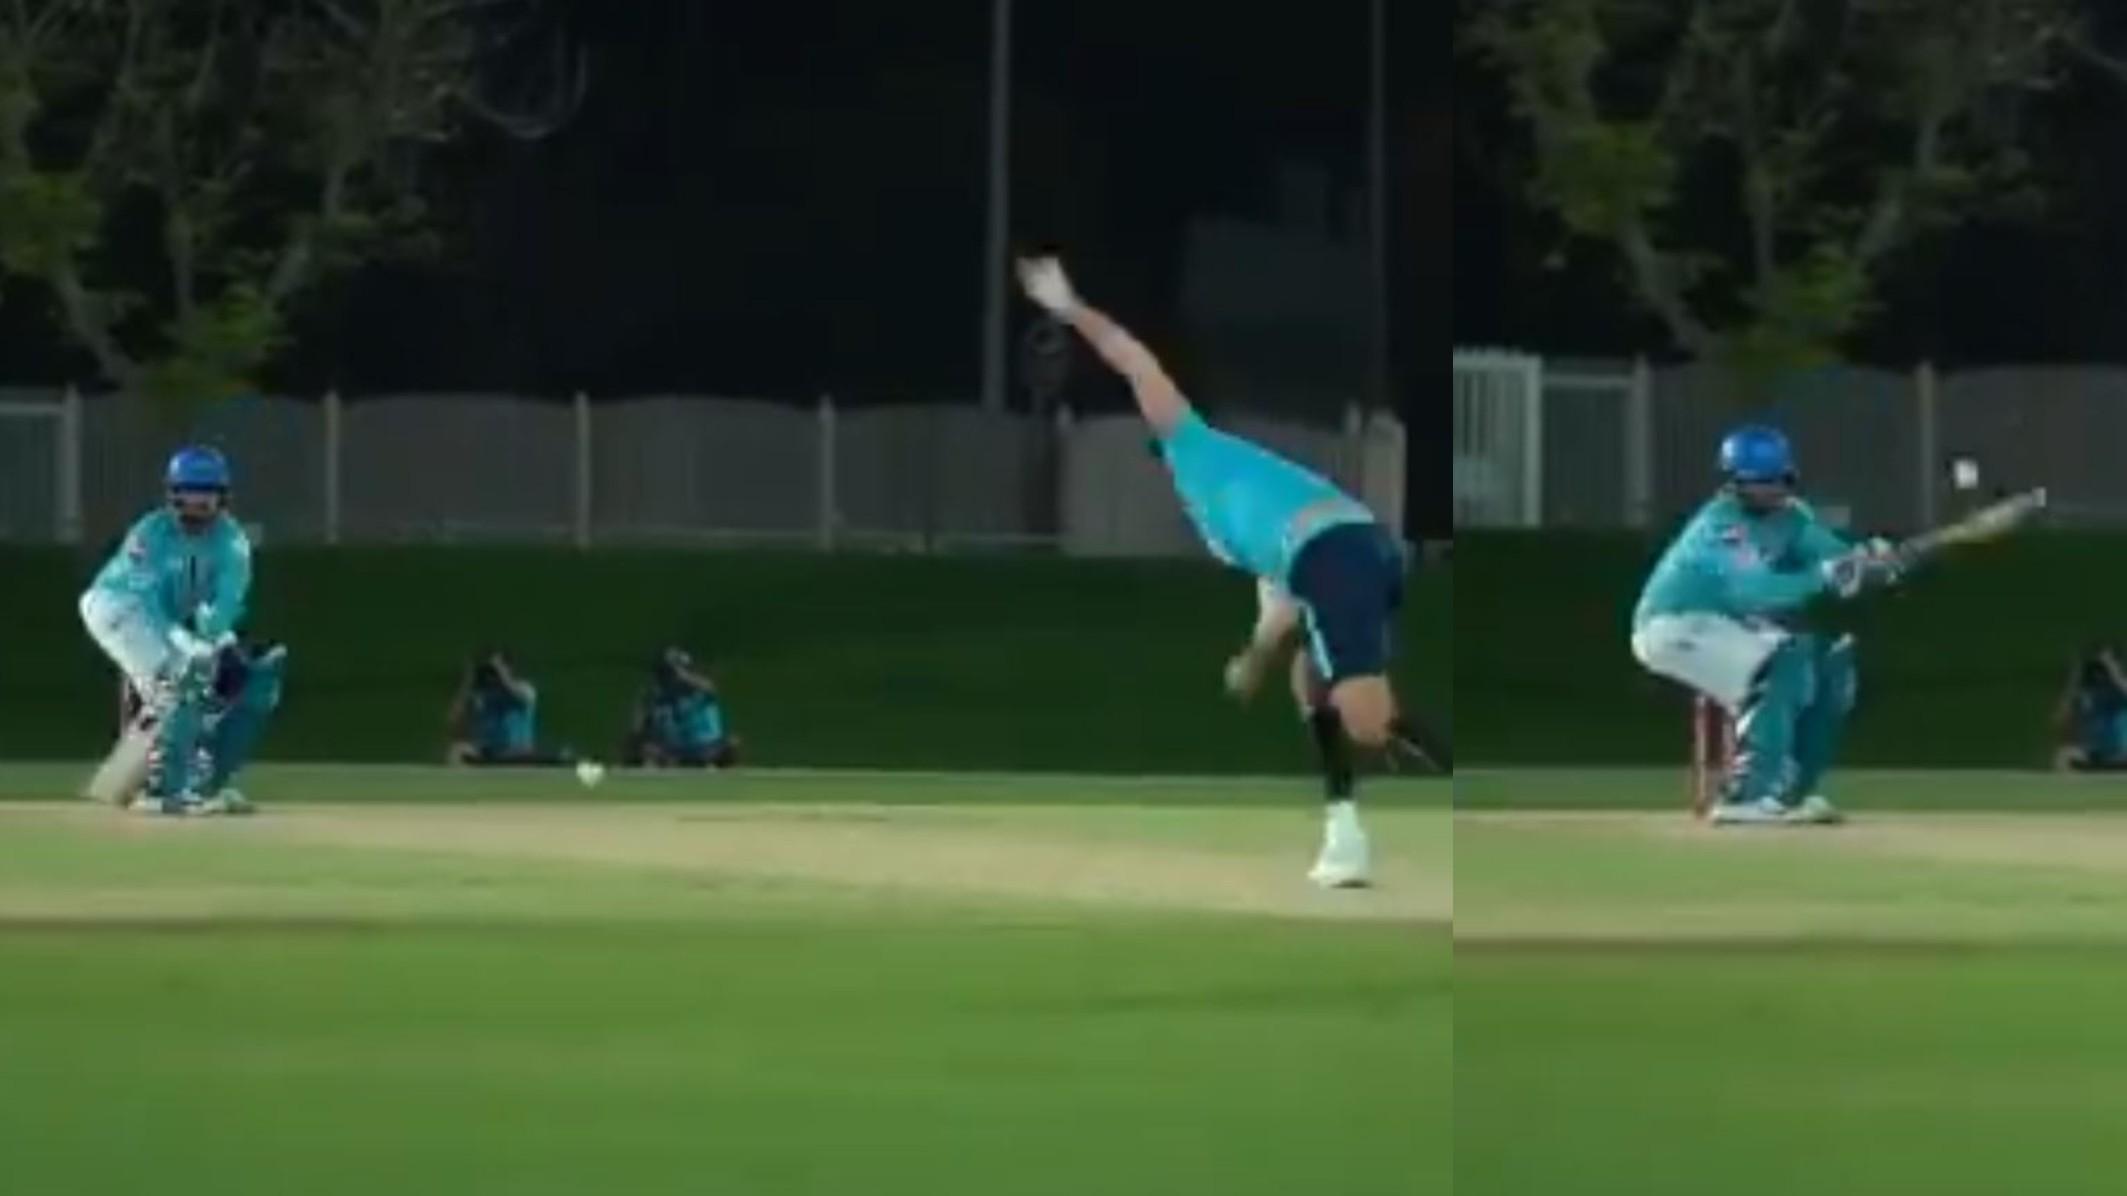 IPL 2020: WATCH - Rishabh Pant hits a a reverse ramp shot against a surprised Ishant Sharma